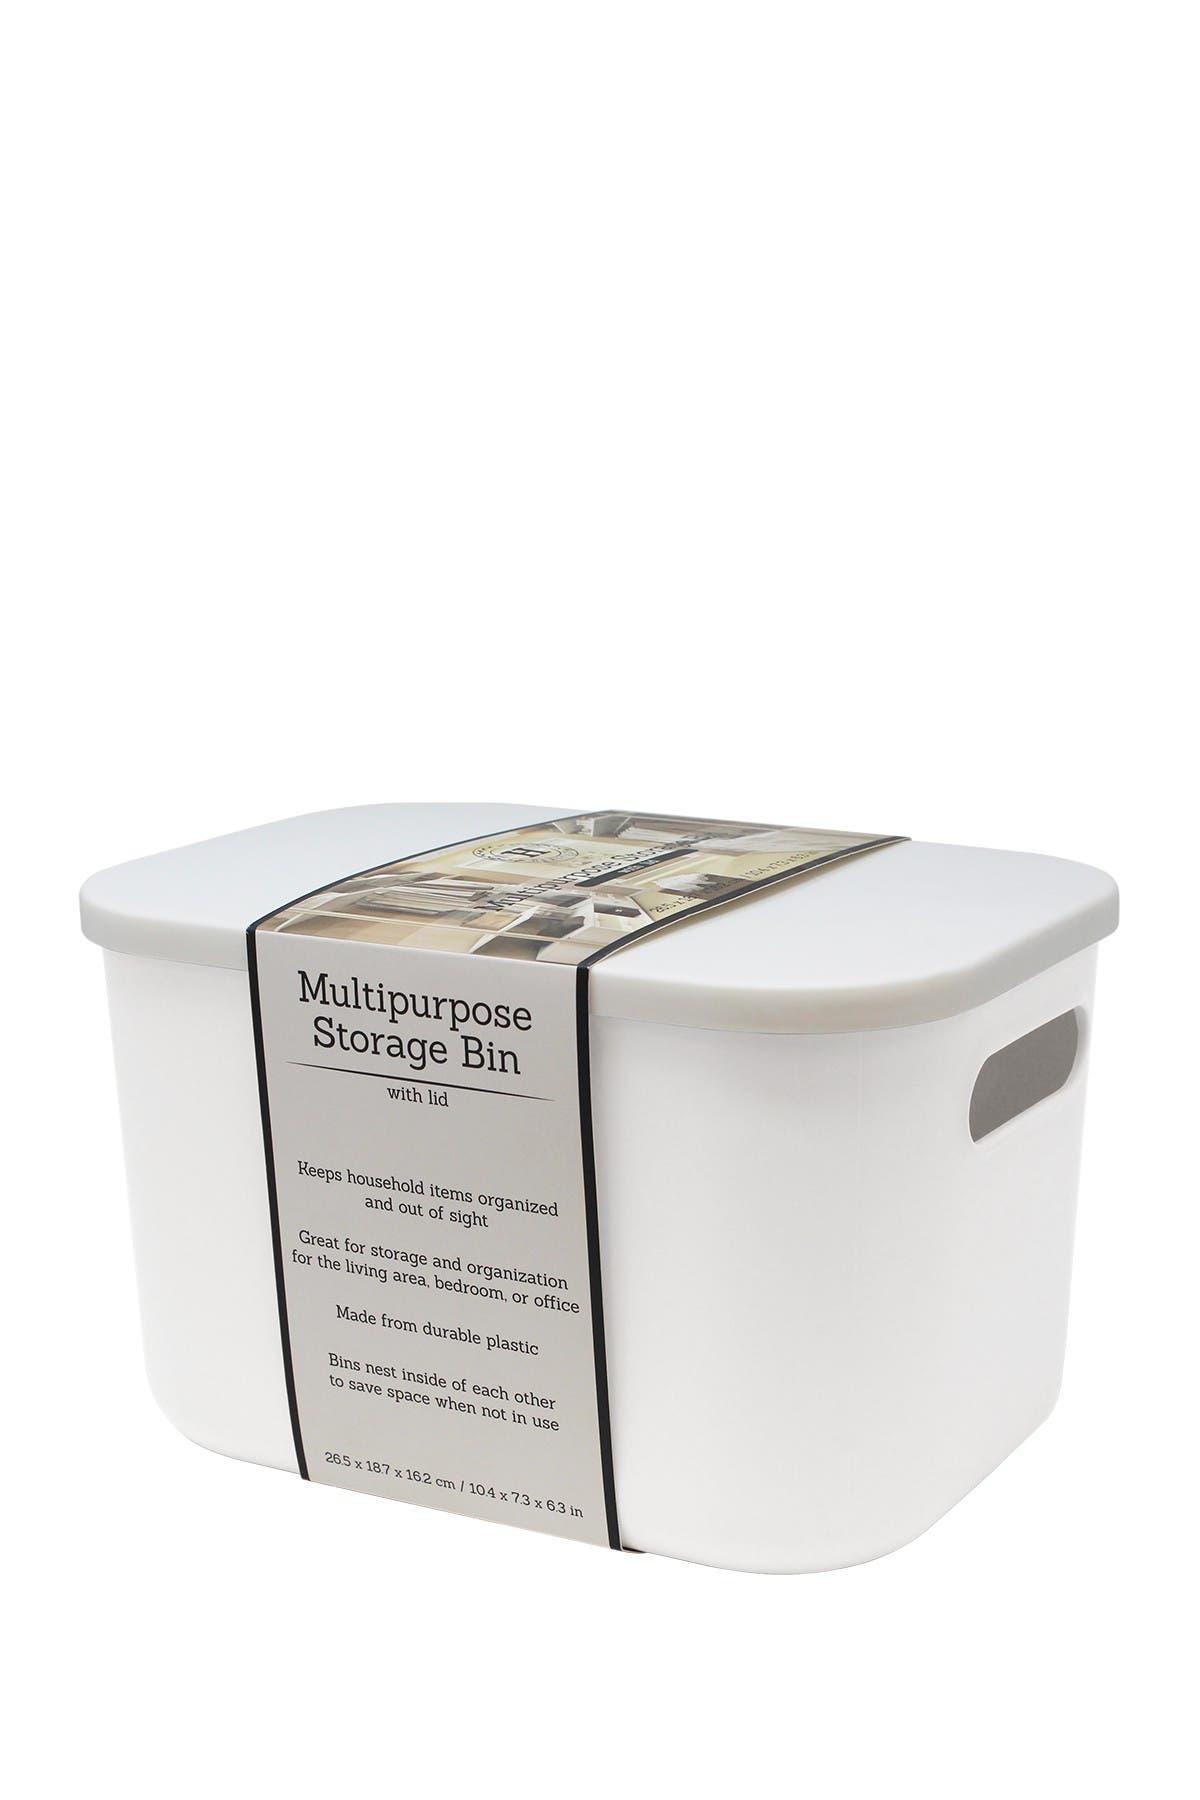 Image of Gourmet Home Heritage White Large Multipurpose Storage Bin